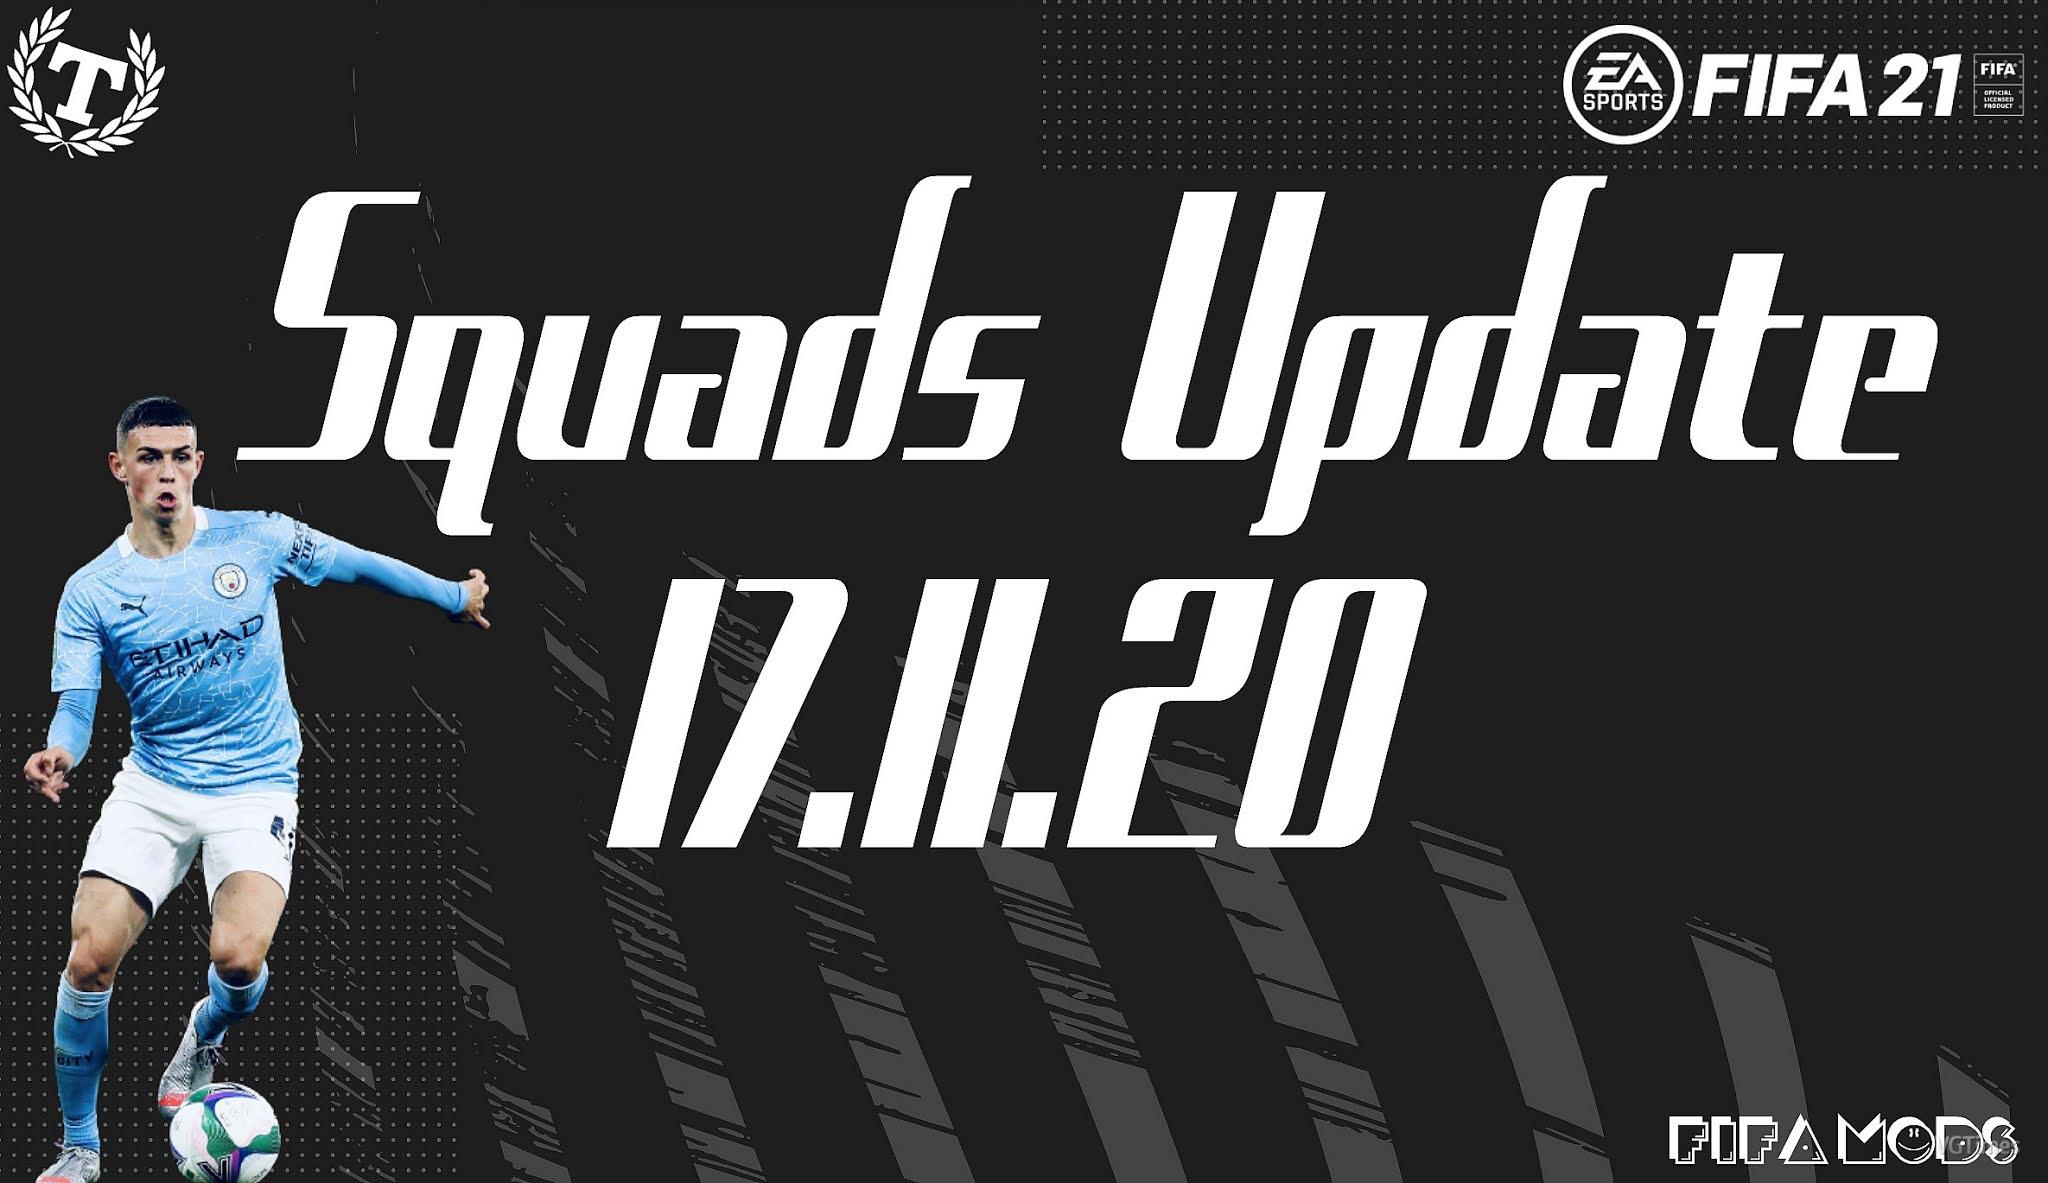 FIFA 21: Squad update (17/11/2020) Download